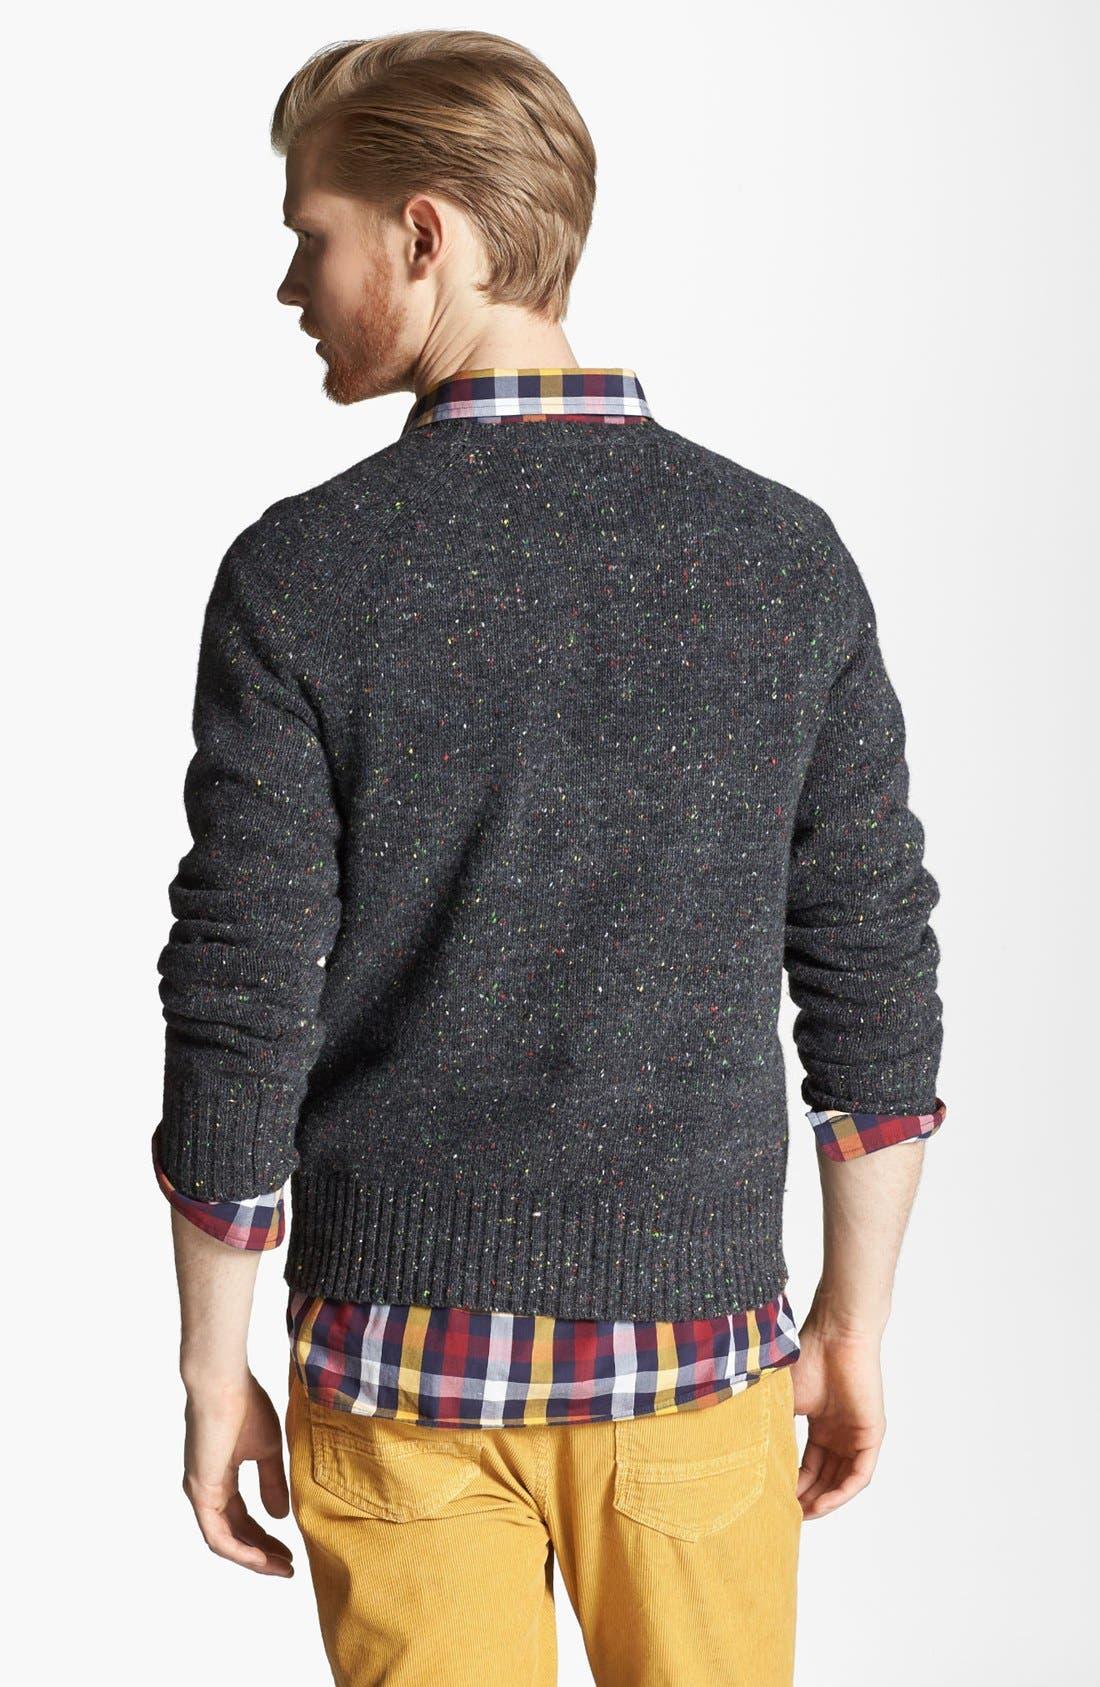 JACK SPADE, 'Wendell' Crewneck Sweater, Alternate thumbnail 2, color, 072